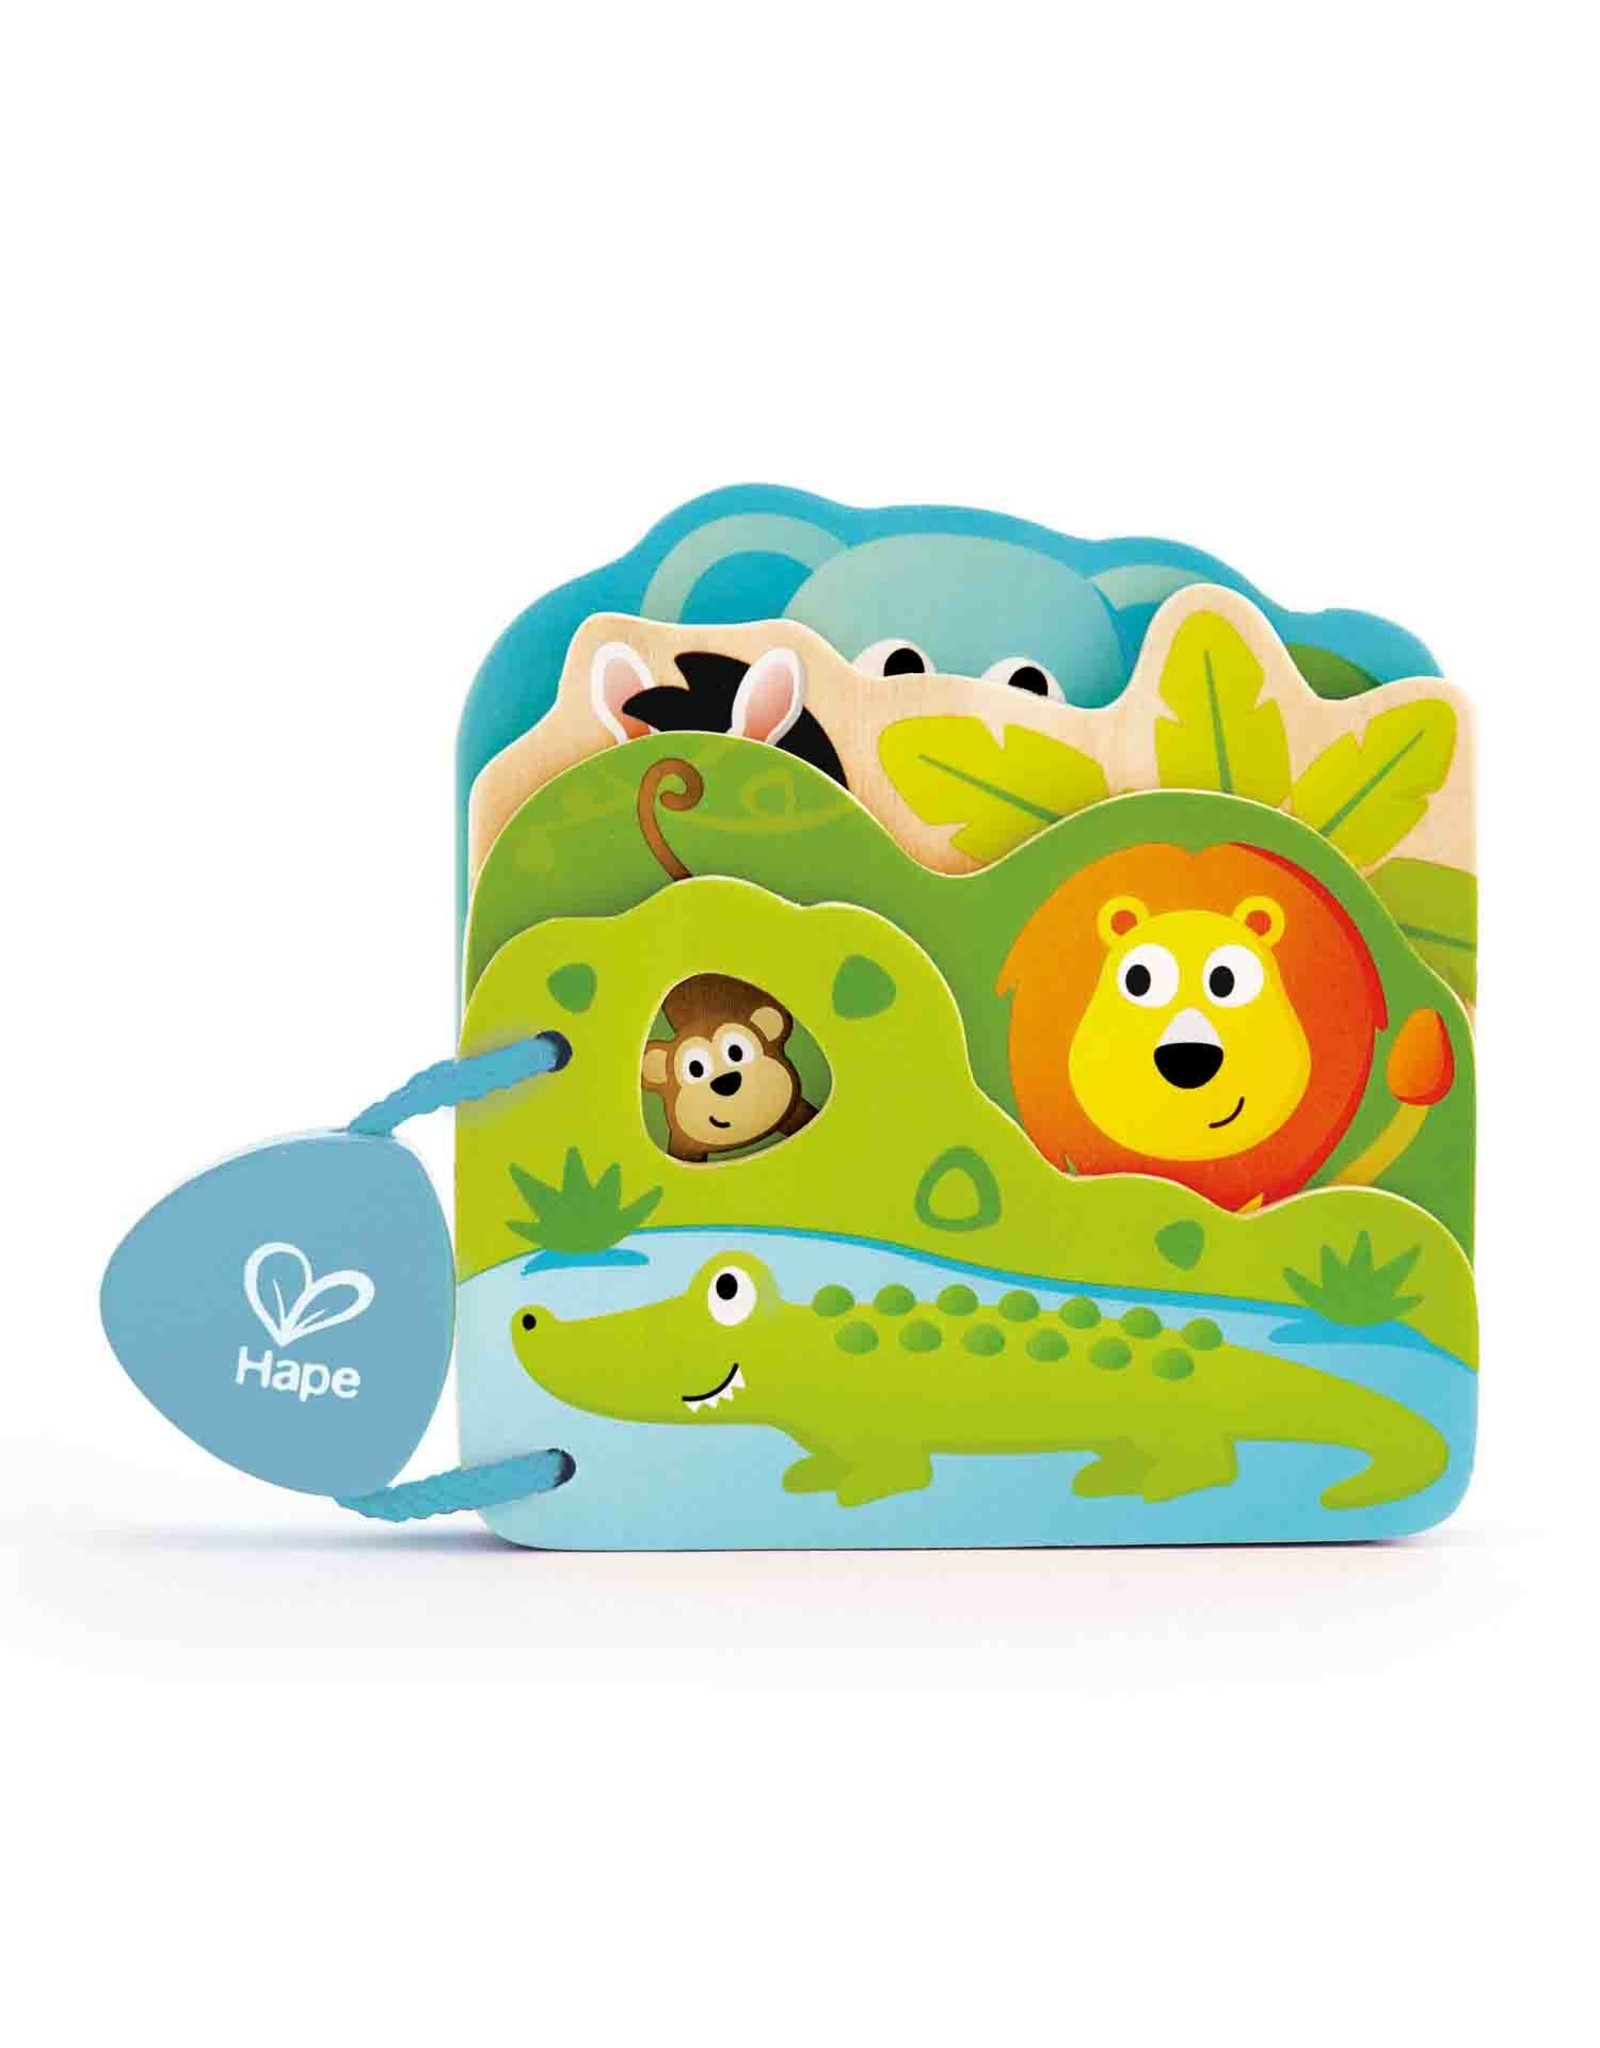 Hape Baby's Wild Animal Book